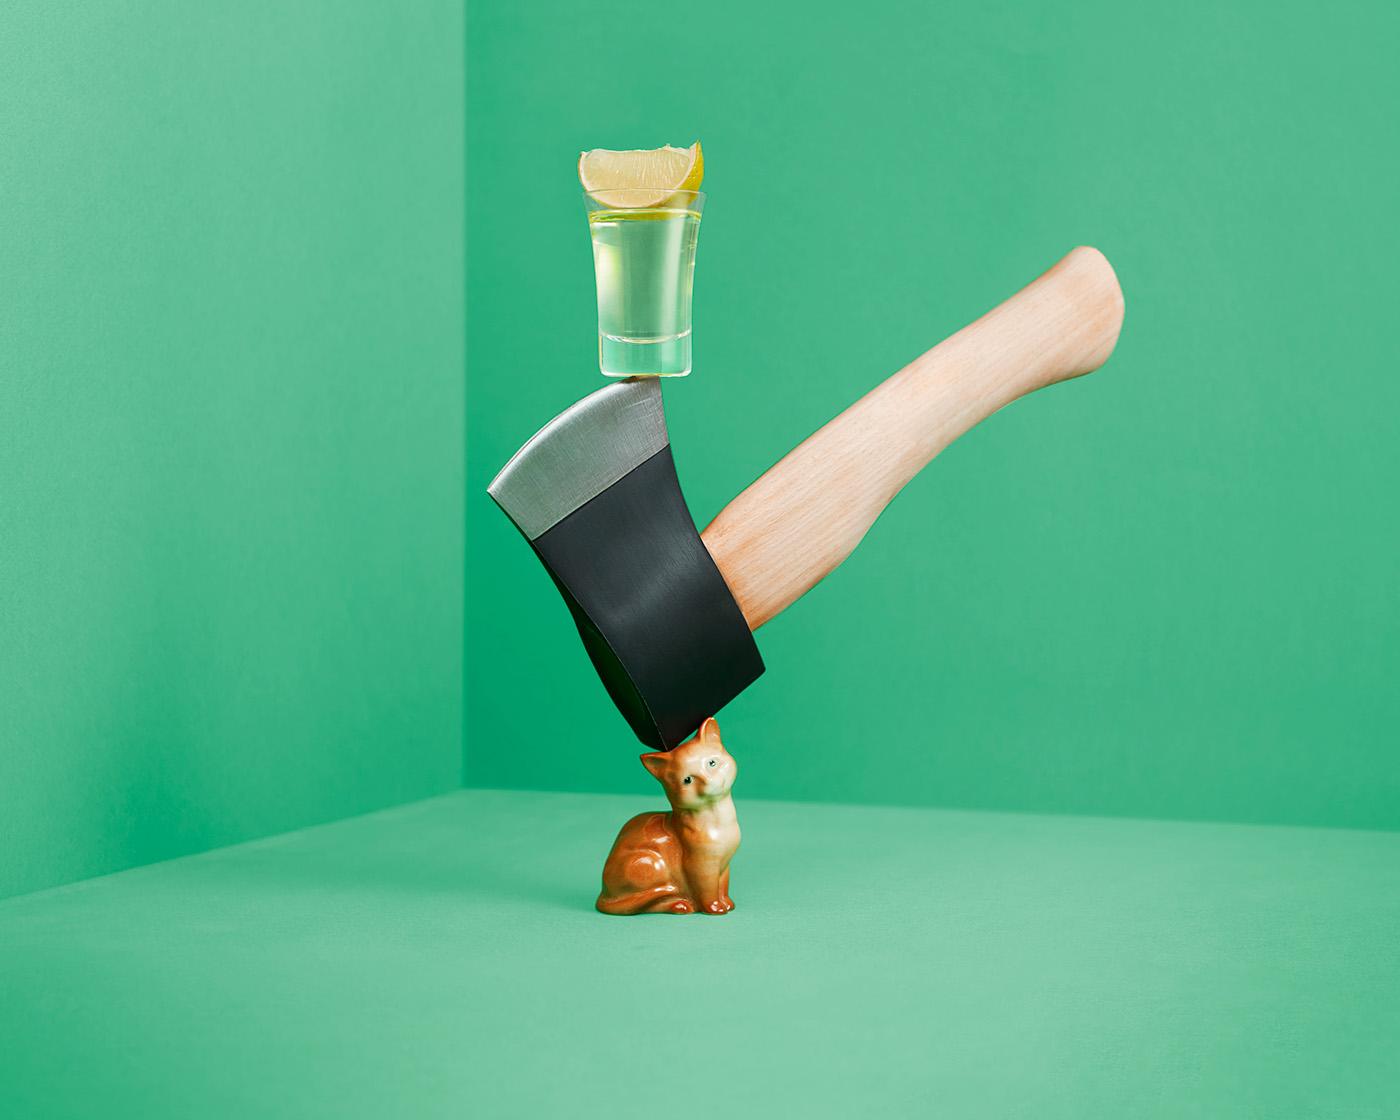 A Fine Balance | Danny Eastwood #artpeople